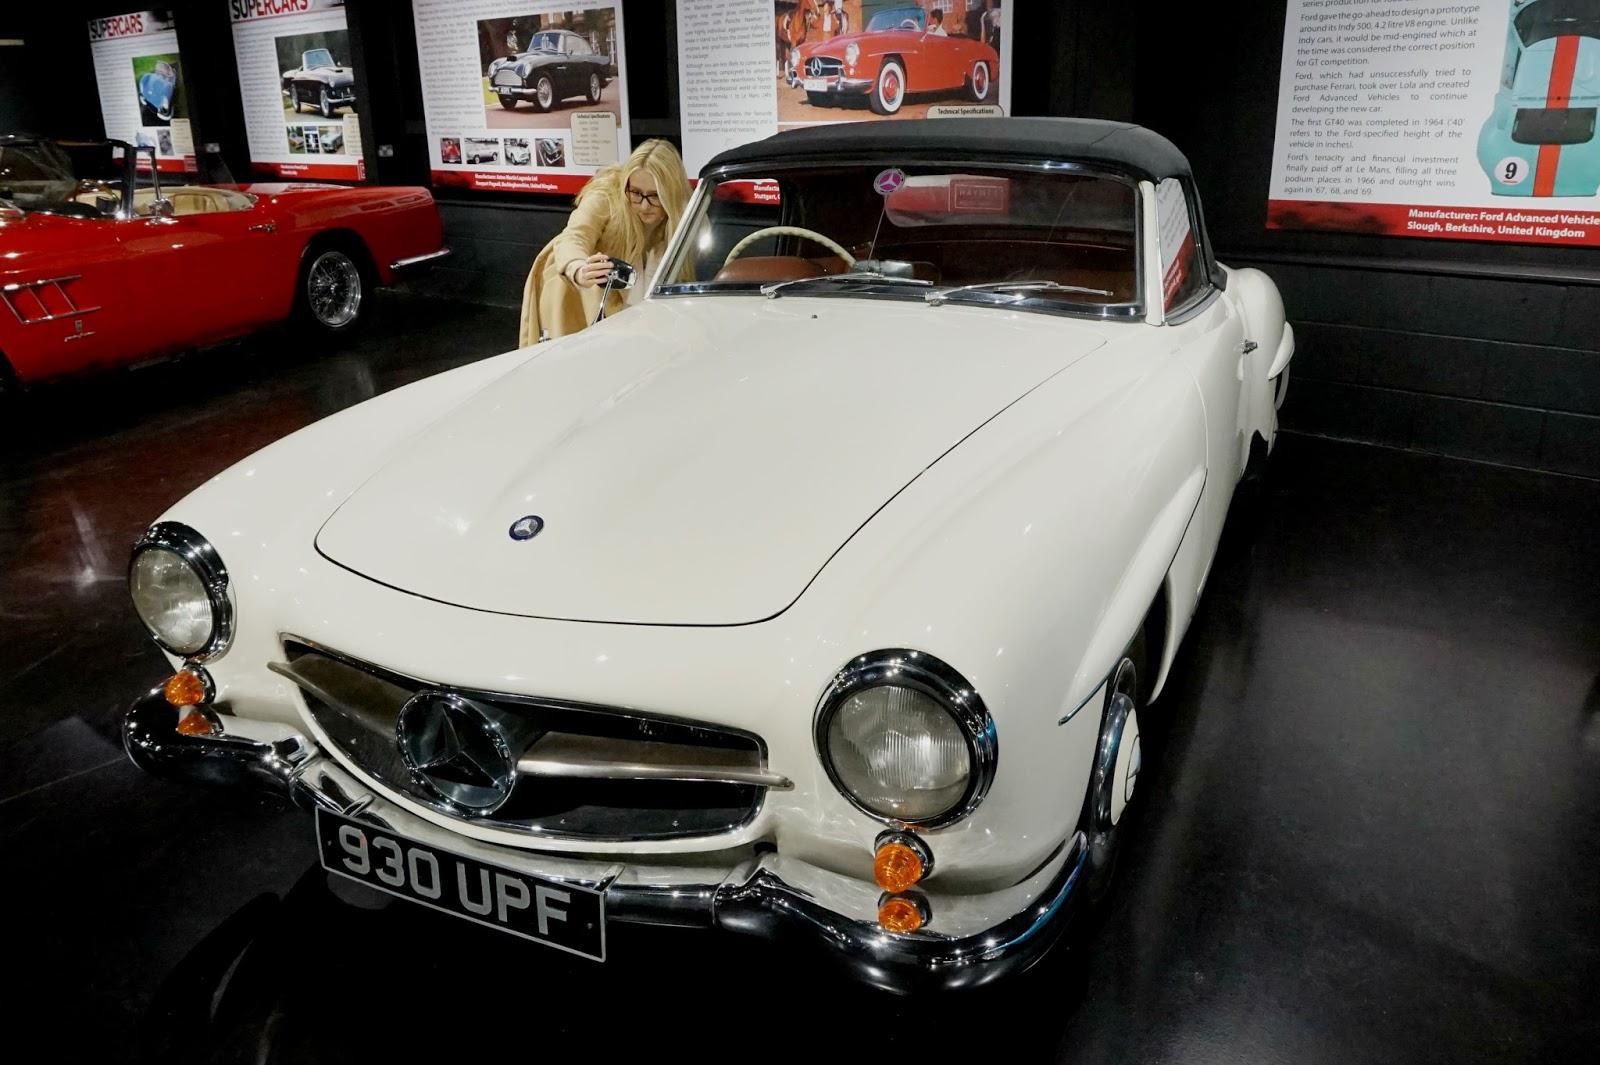 Mercedes super car classic white sports car selfie new car haynes motor museum